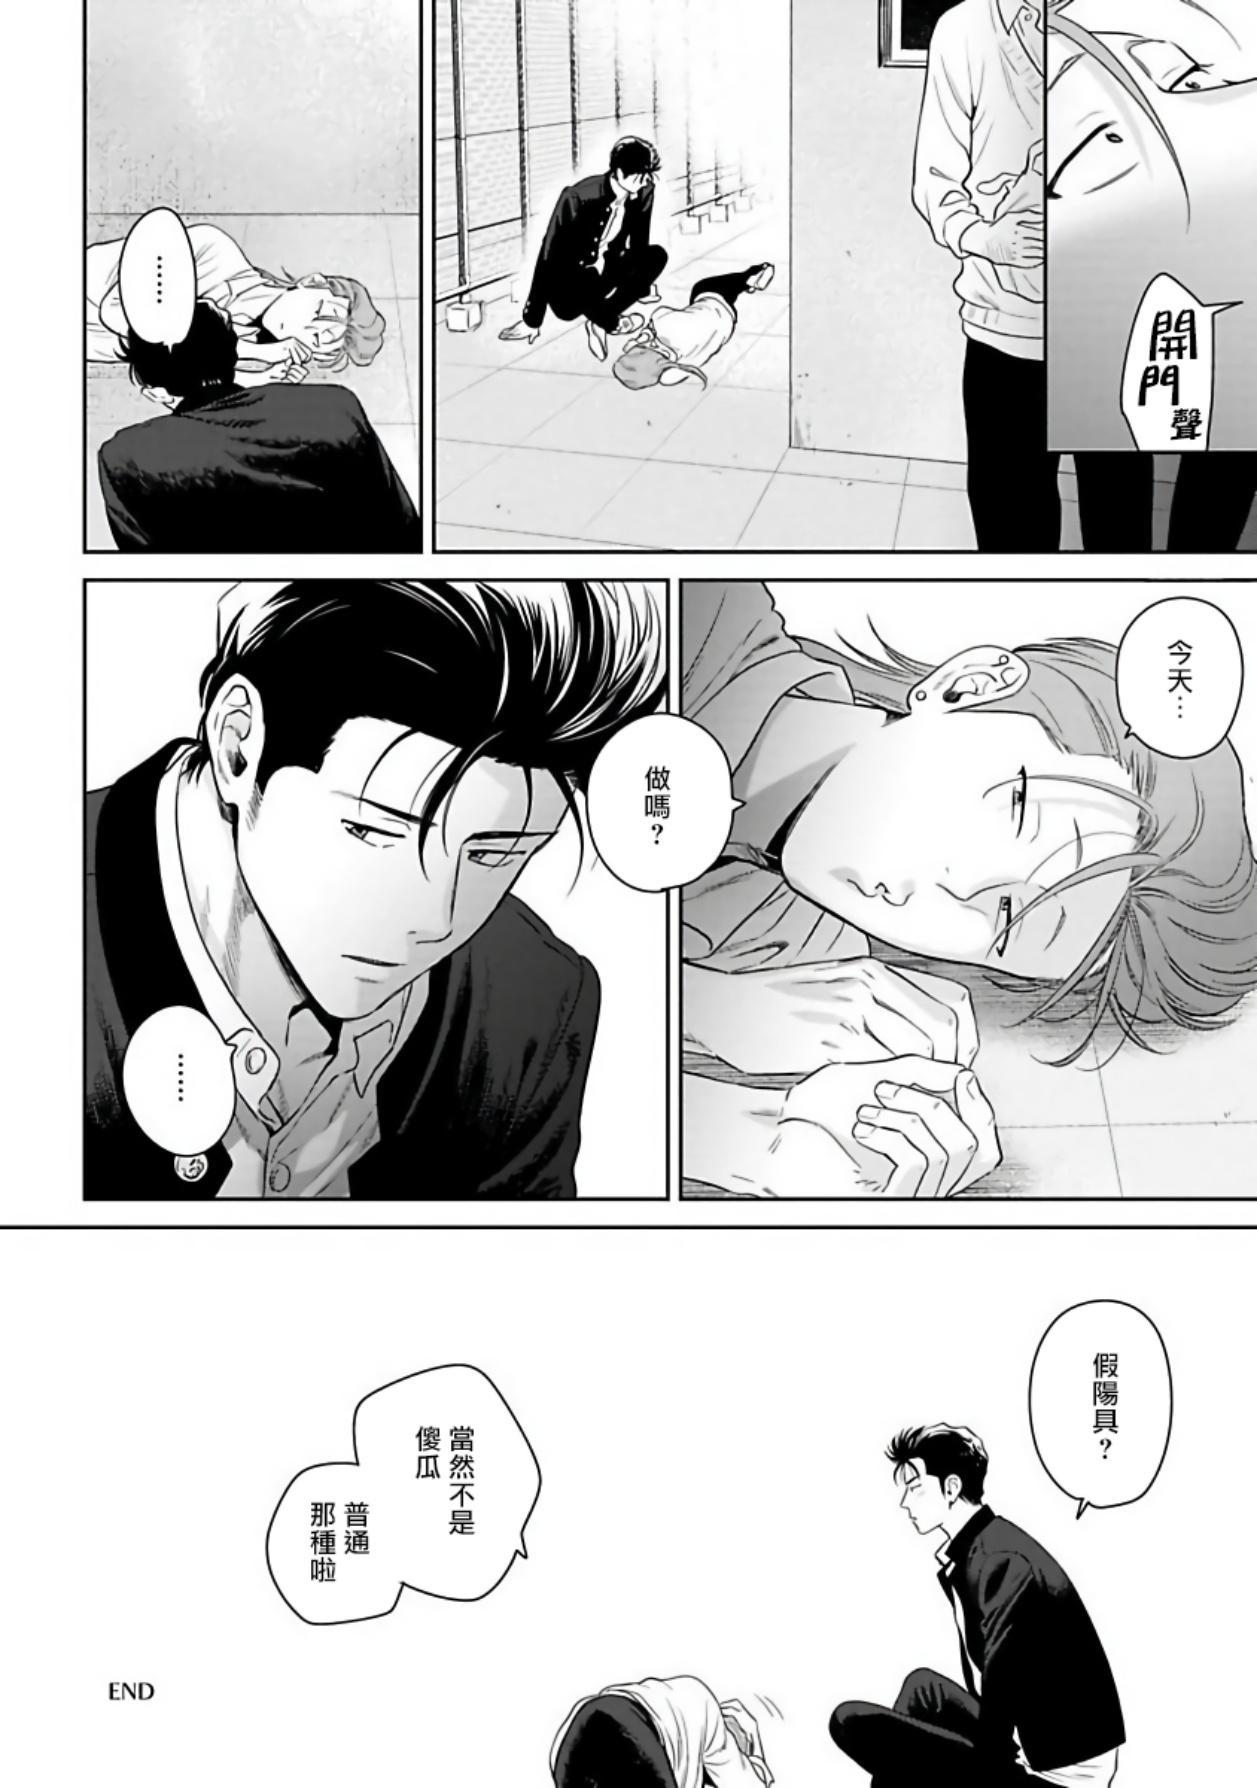 Nakasete Yaru yo Yankee-kun   让你哭噢小混混 番外 6